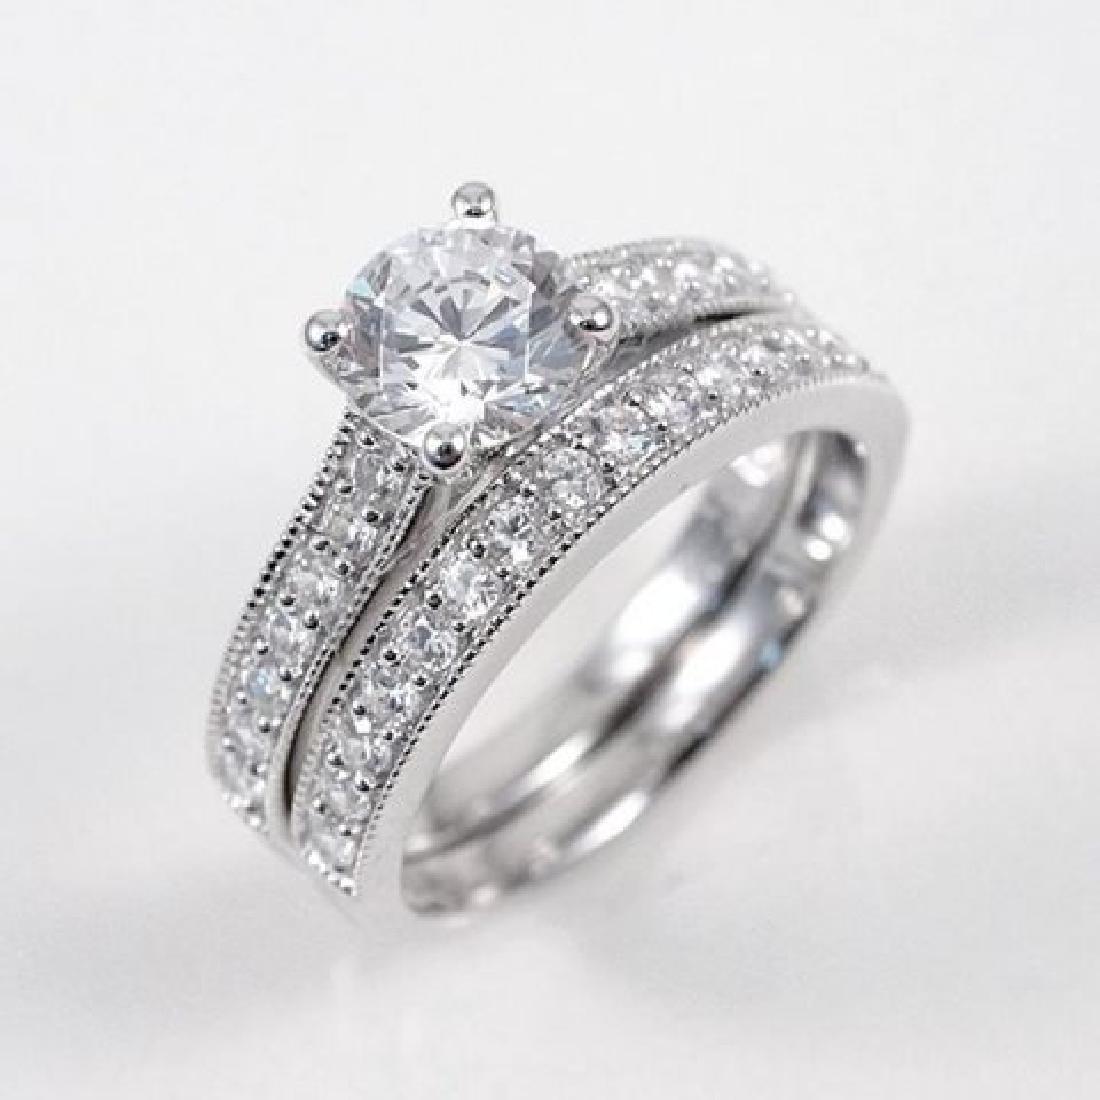 Creation Diamond Ring 1.88 Carat 14k W/g Overlay - 3